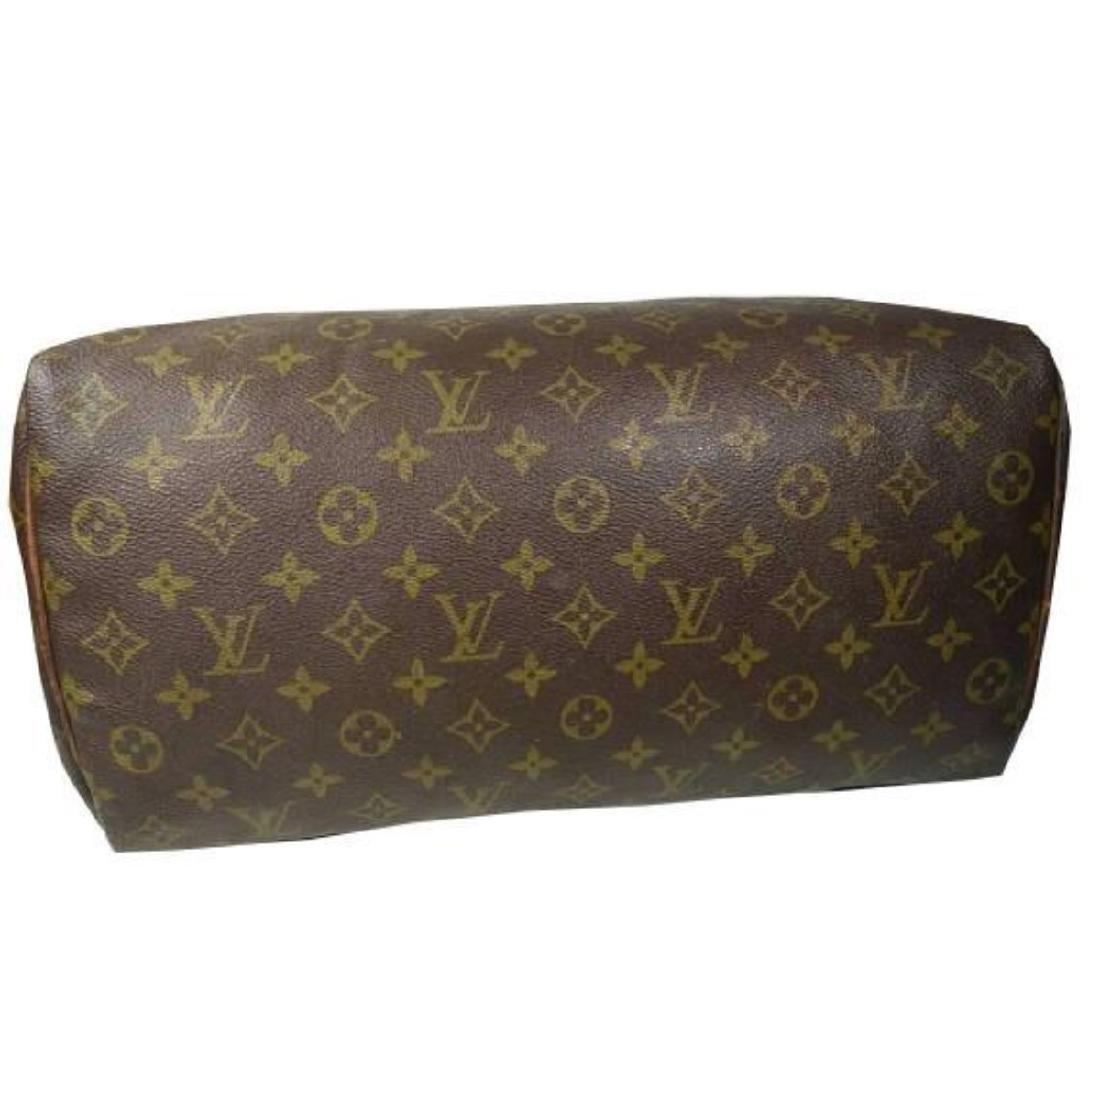 Auth Louis Vuitton Vintage Handbag Speedy 35 Monogram - 4